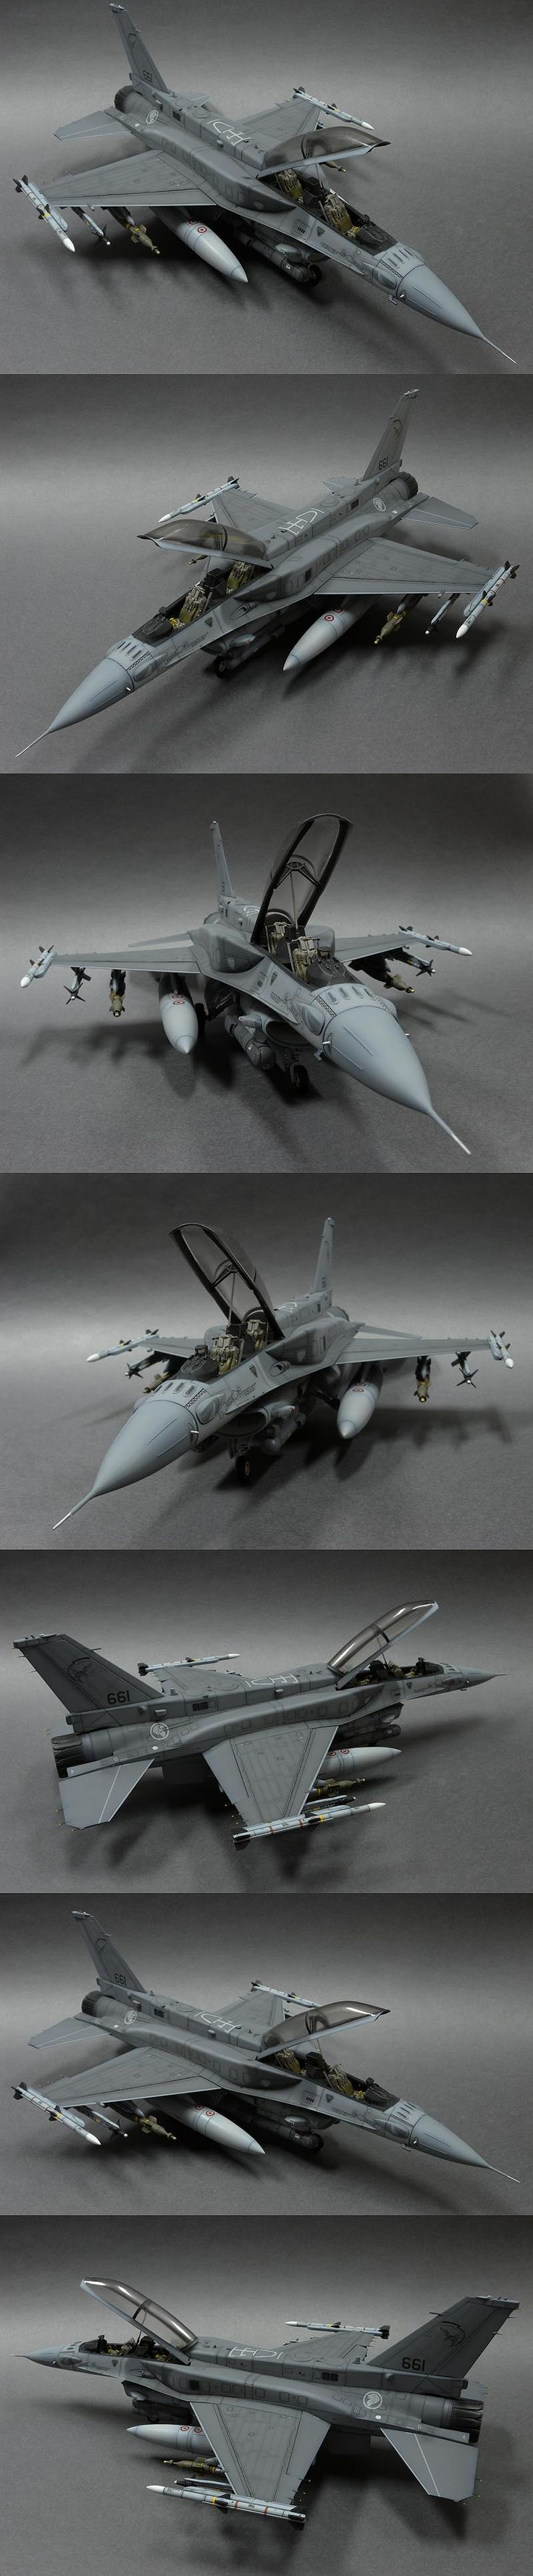 F-16D | #Scale_model 1/35